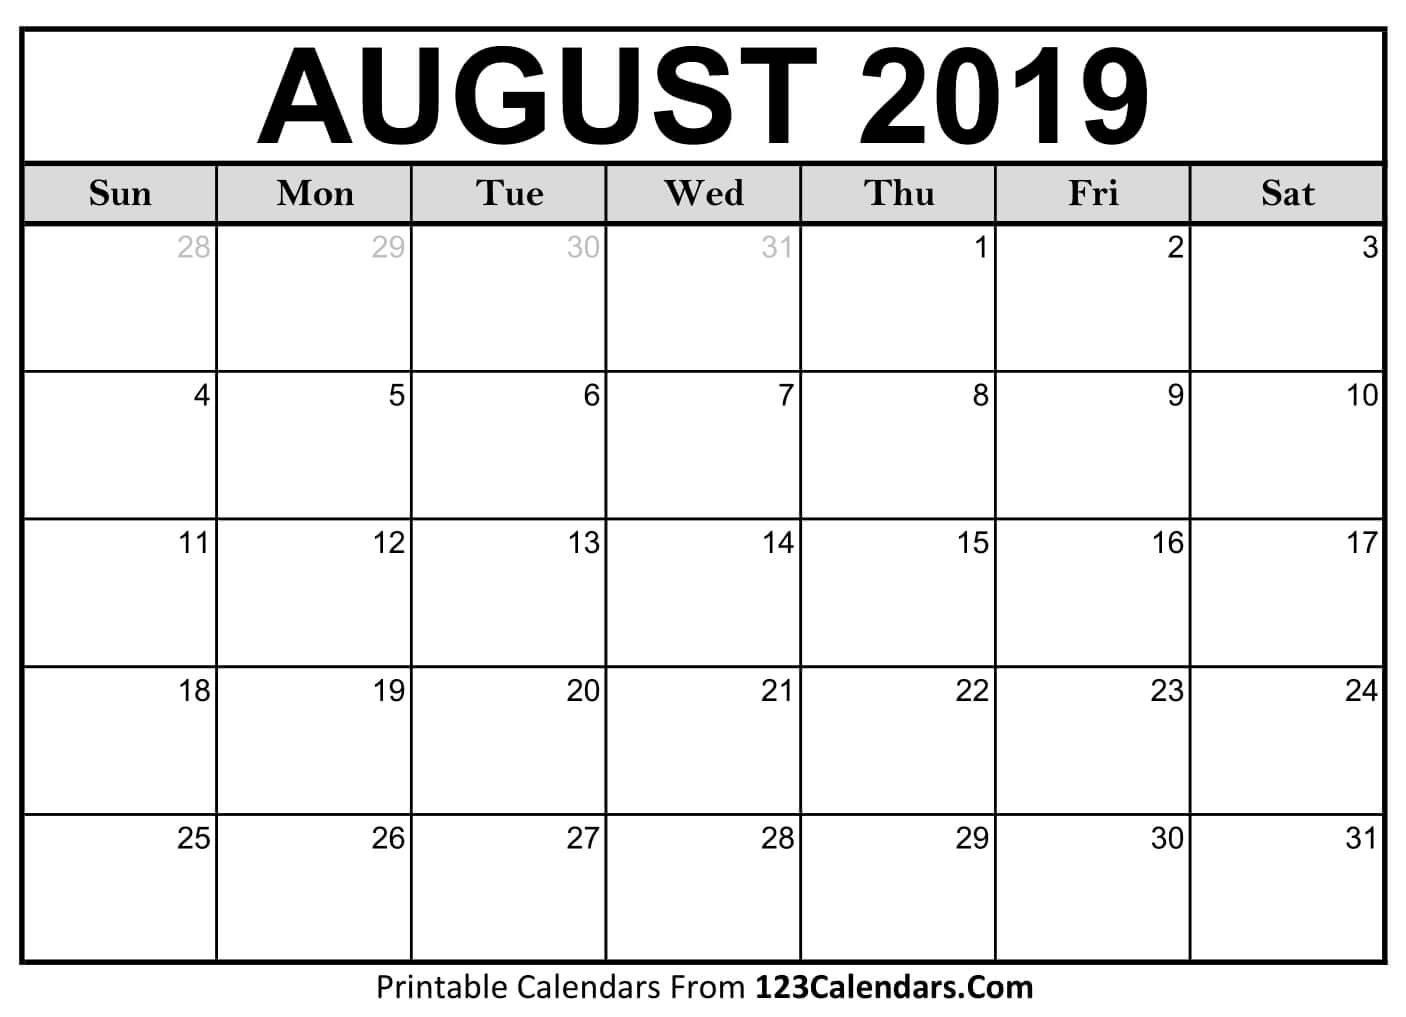 Printable August 2019 Calendar Templates – 123Calendars Calendar Of 2019 August